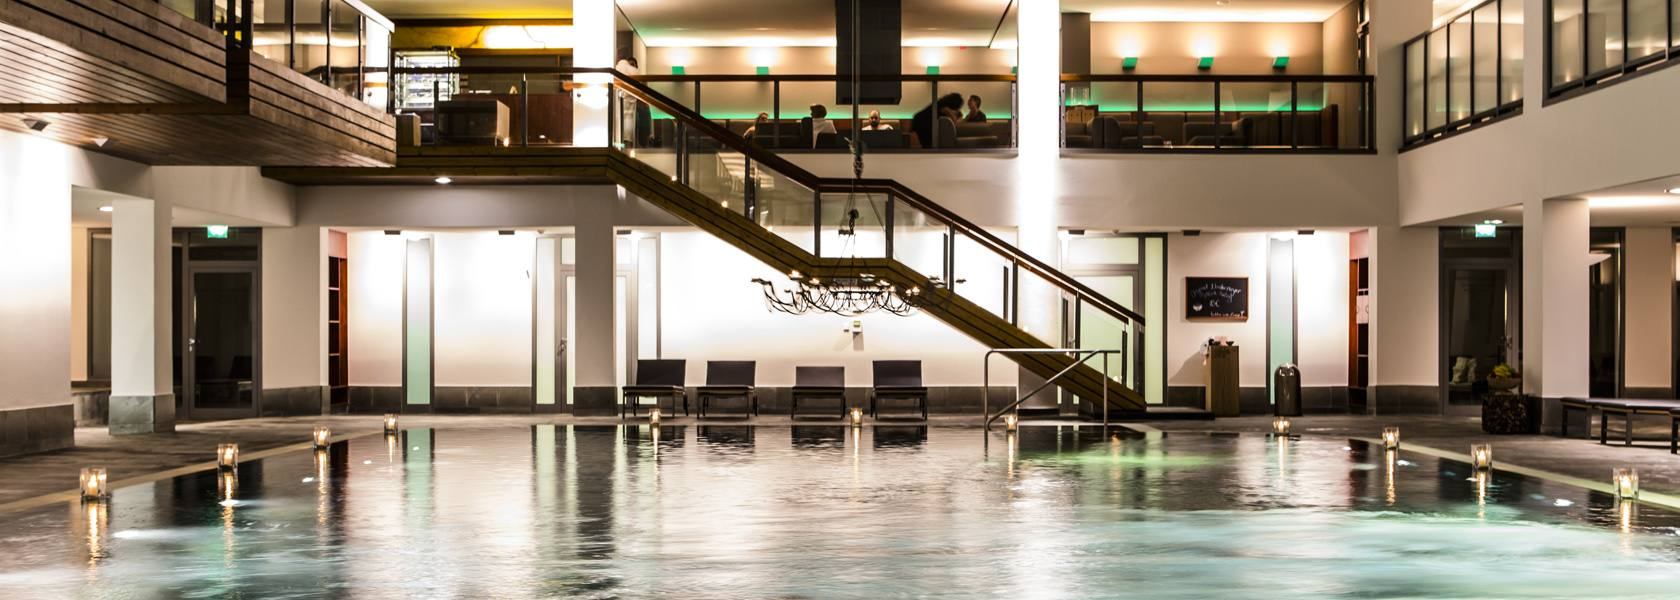 bade:haus norderney, © Staatsbad Norderney GmbH